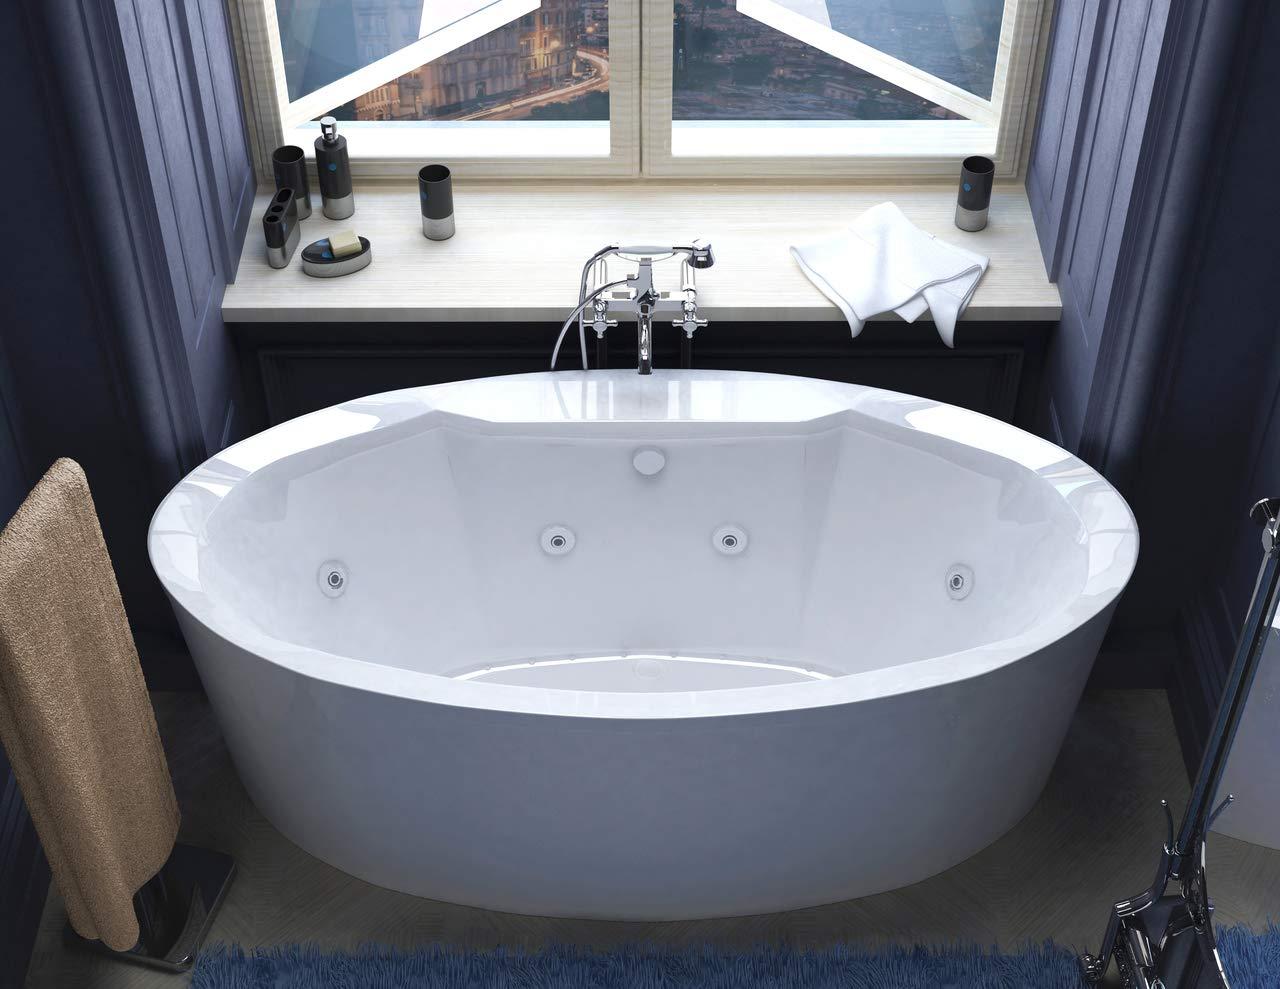 stylish-freestanding-bathtub-with-jets-33-inch-deep-soak-tub